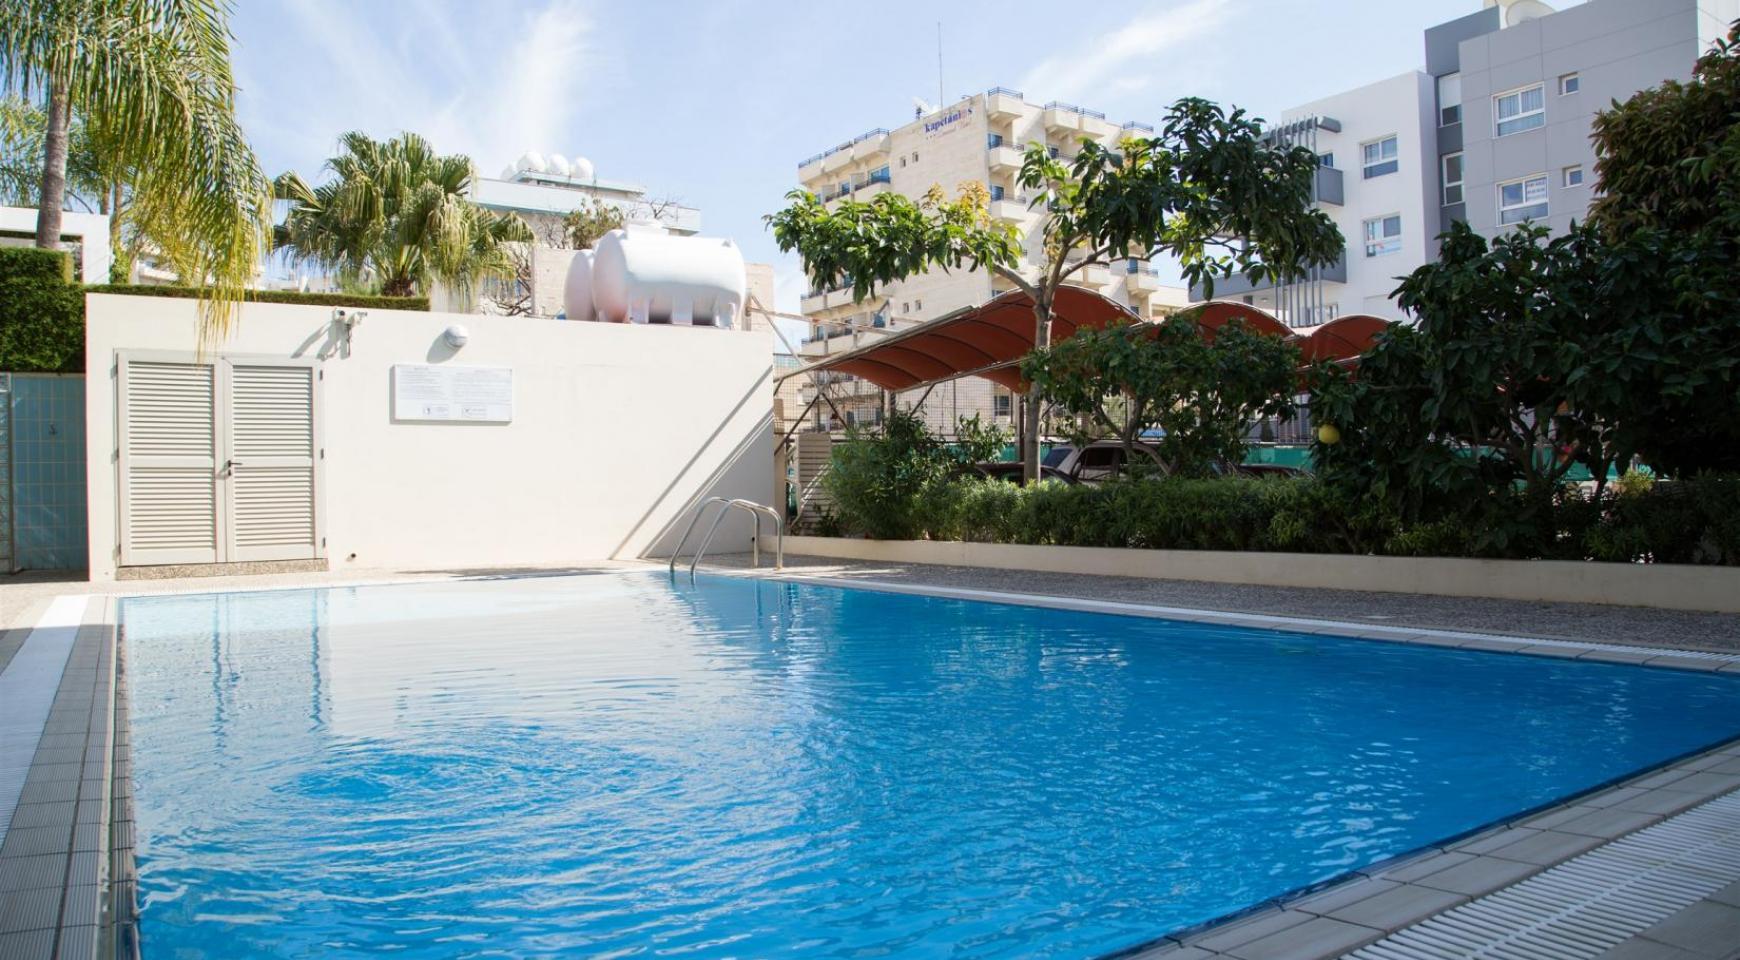 Luxury 3 Bedroom Apartment in Enaerios Area near the Sea - 25